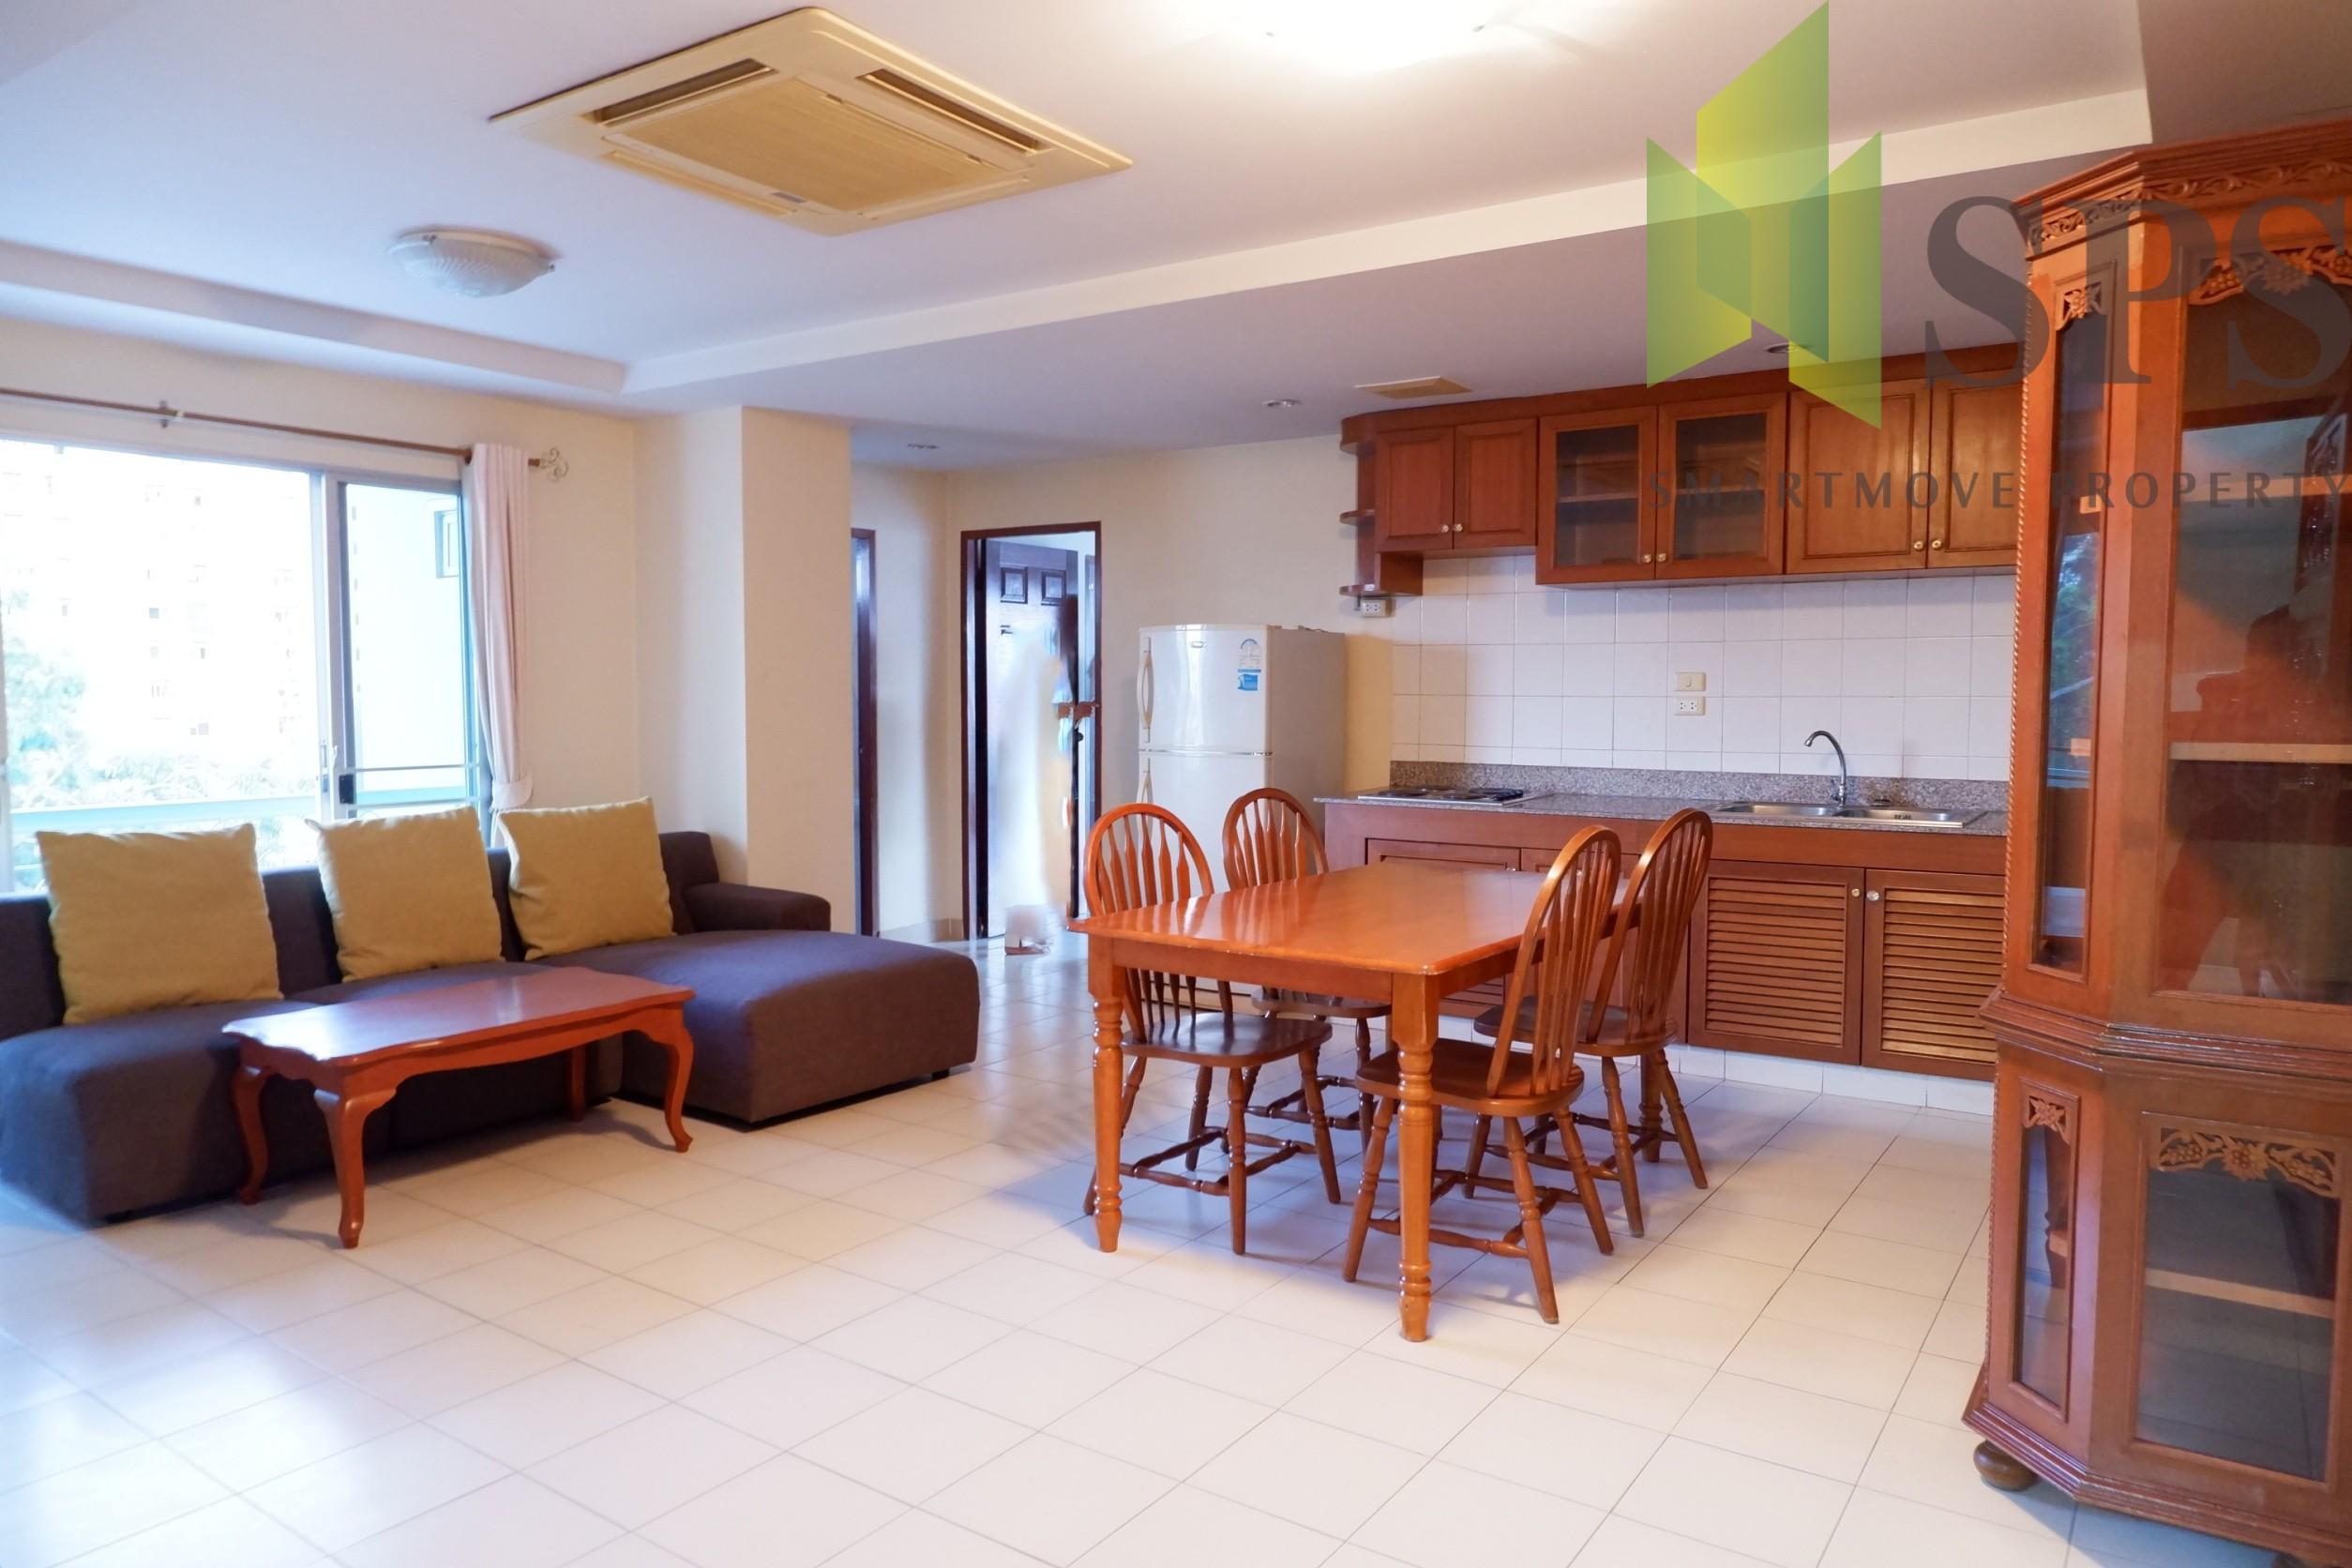 Apartment Sukhumvit 71 ให้เช่าอพาร์ทเม้นท์ สุขุมวิท 71(SPS-GC681 )